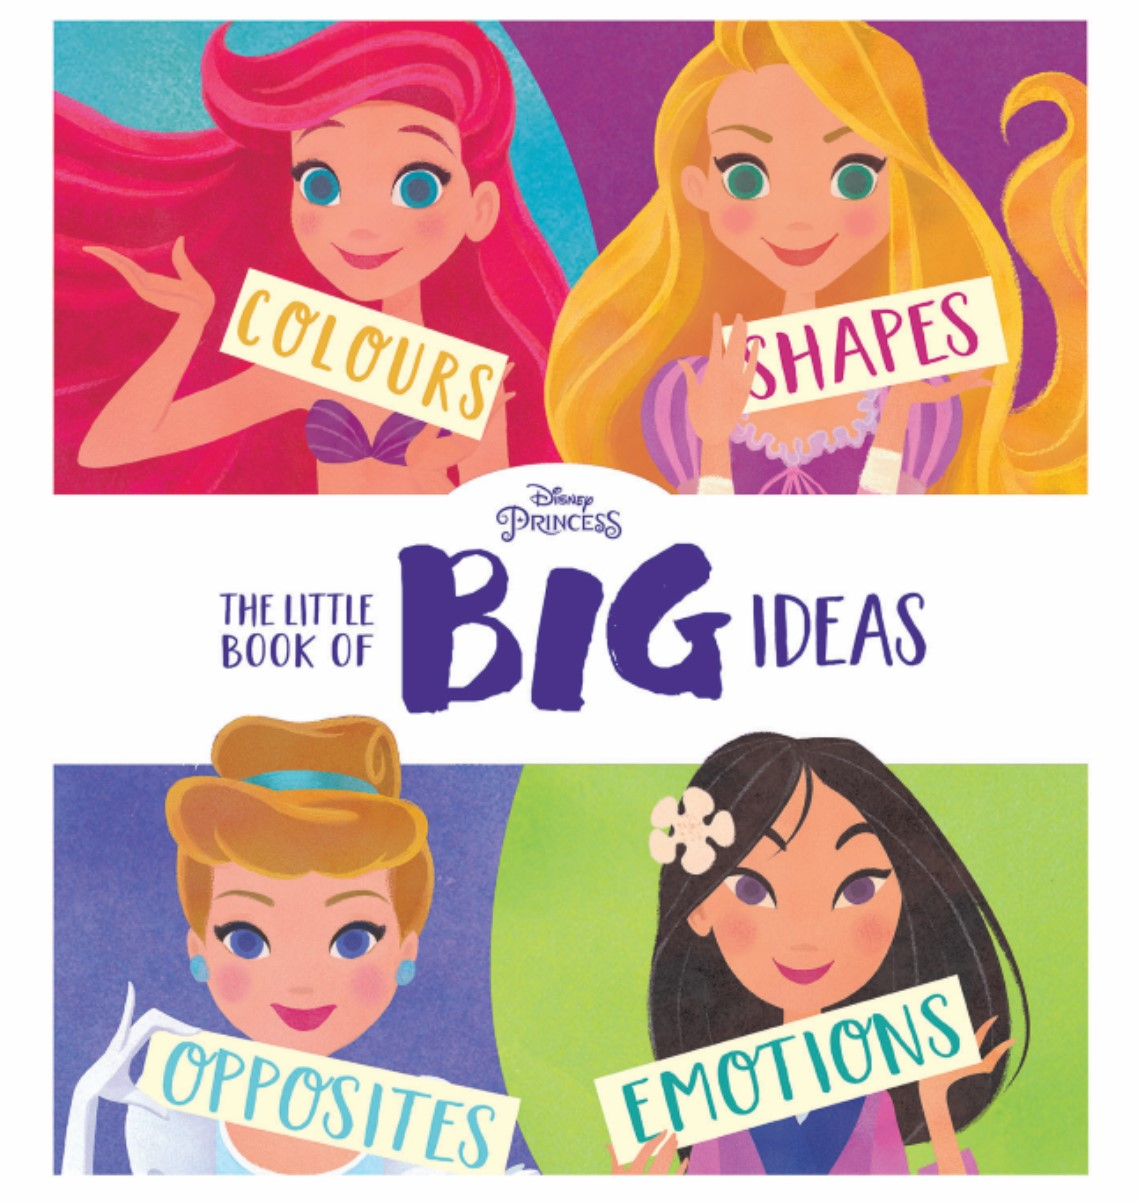 The Little Book of Big Ideas (Disney Princess)